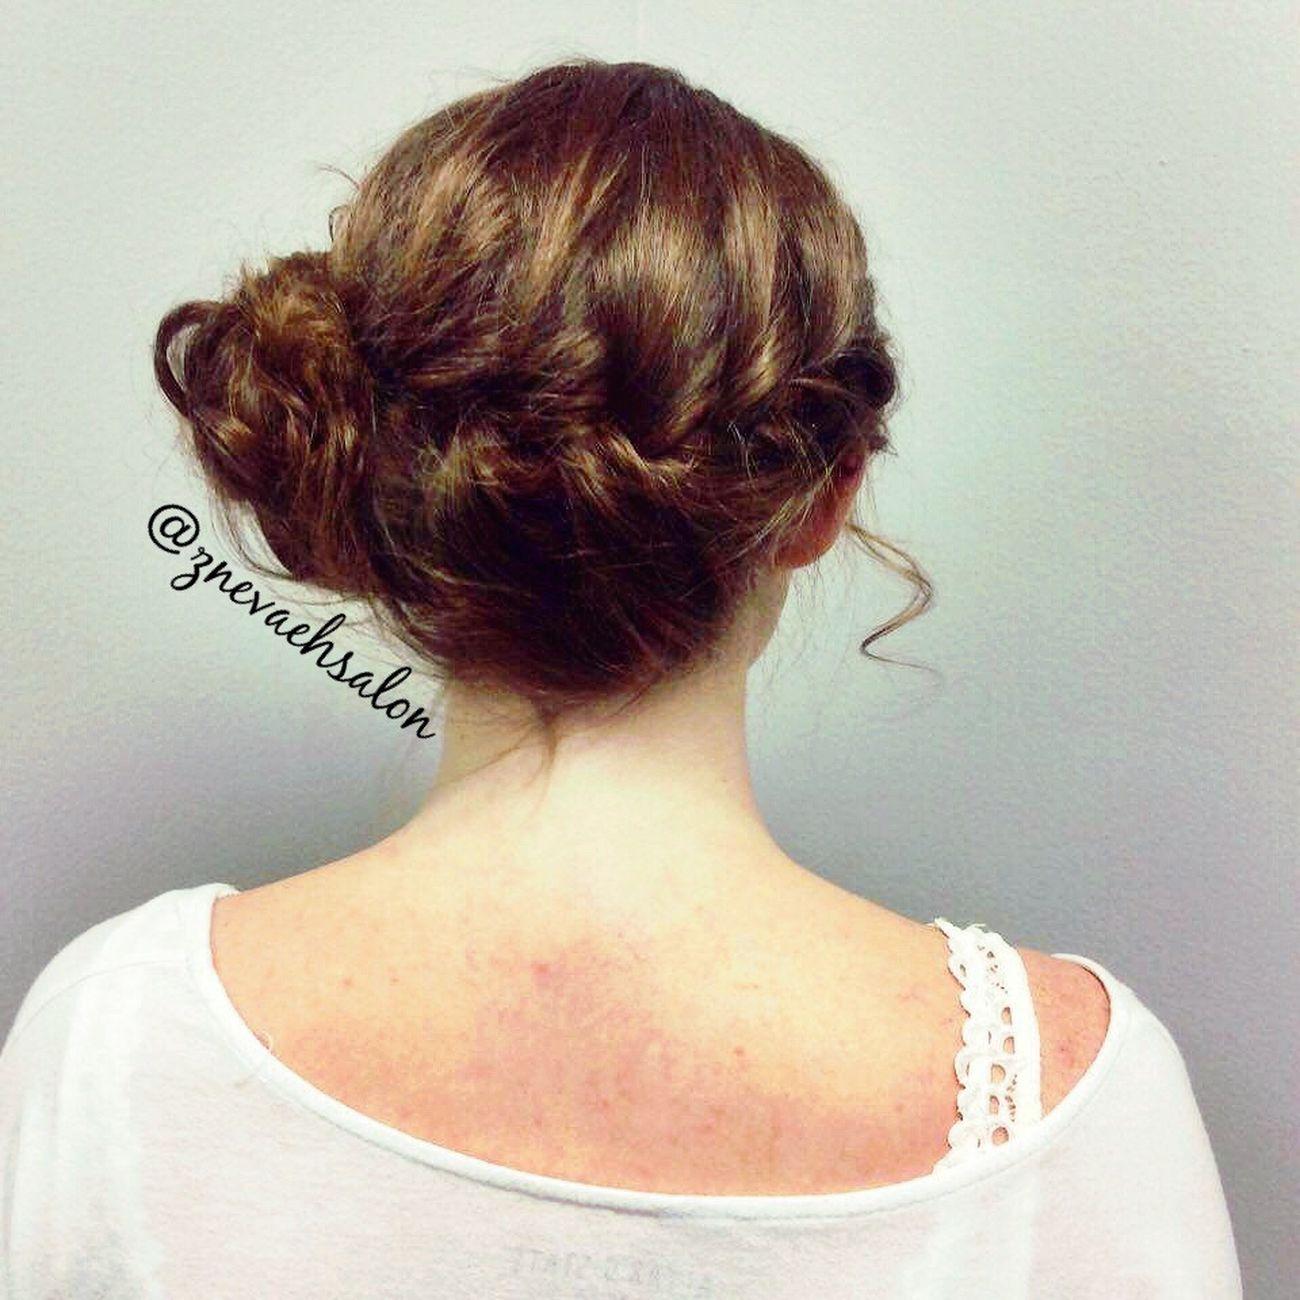 Braids & Bun @znevaehsalon @lorealprous Check This Out Lorealprofessionnelsalon L'Oreal Professionnel Hairstyle Knoxville Salon Z Nevaeh Salon Fashion #style #stylish #love #TagsForLikes #me #cute #photooftheday #nails #hair #beauty #beautiful #instagood #instafashion # Hairtrends Hair Fashion Hair Tecni.art Braids :) Lorealpros